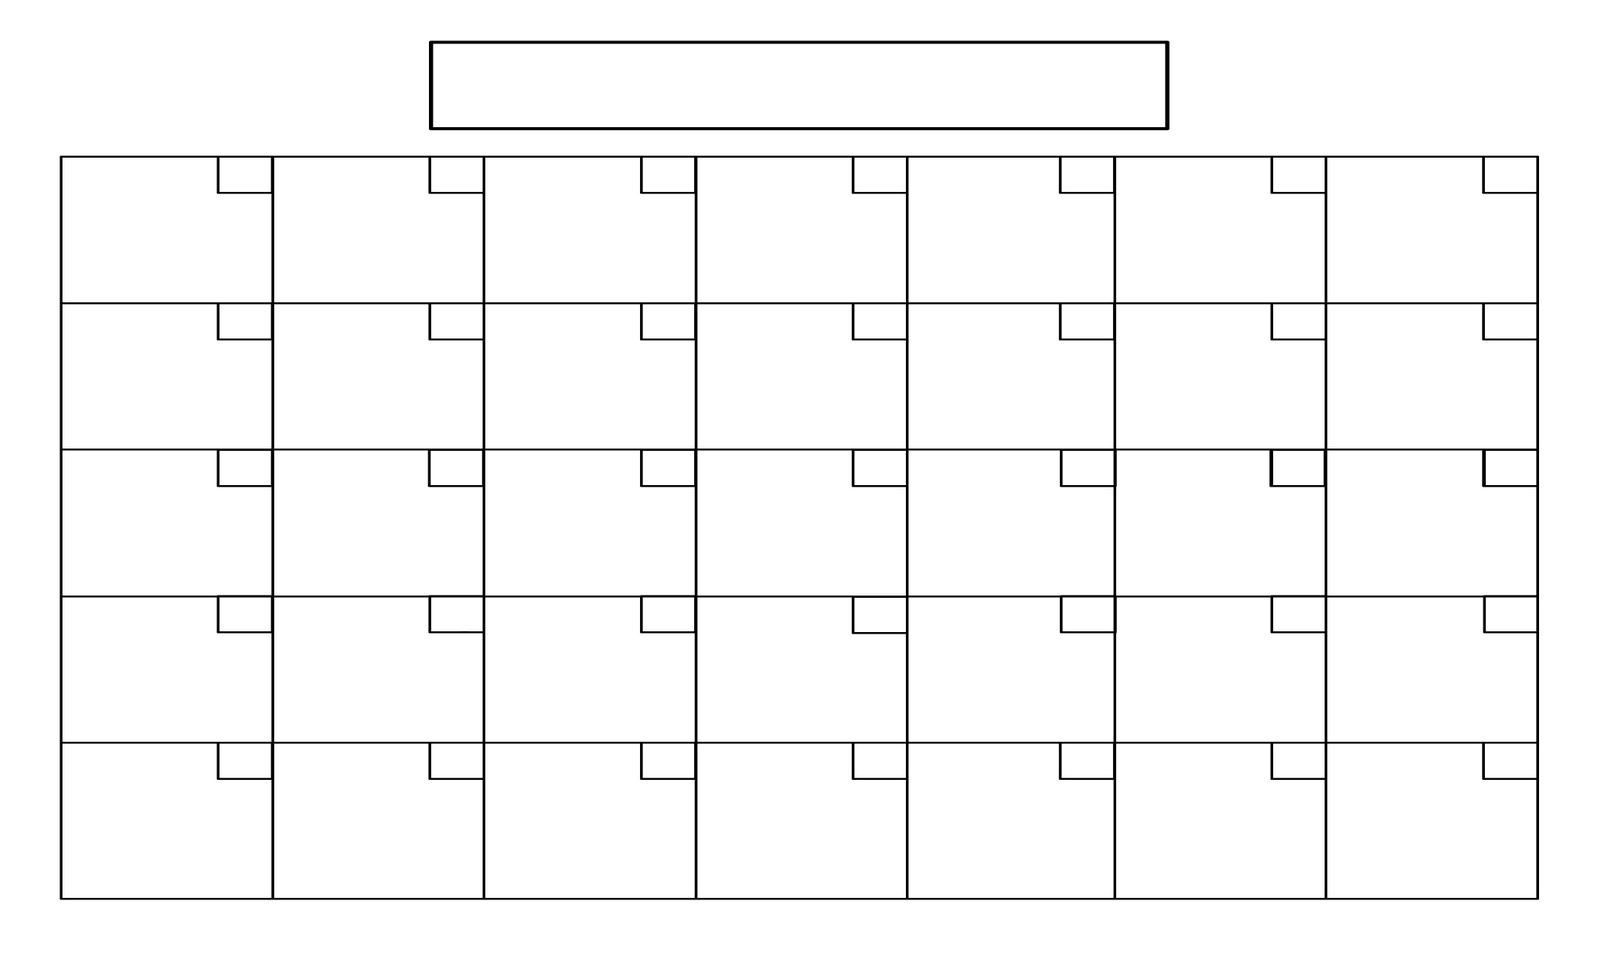 Printable+Full+Page+Blank+Calendar+Template | Boyscout | Free  2014 Calendar Printable Full Page